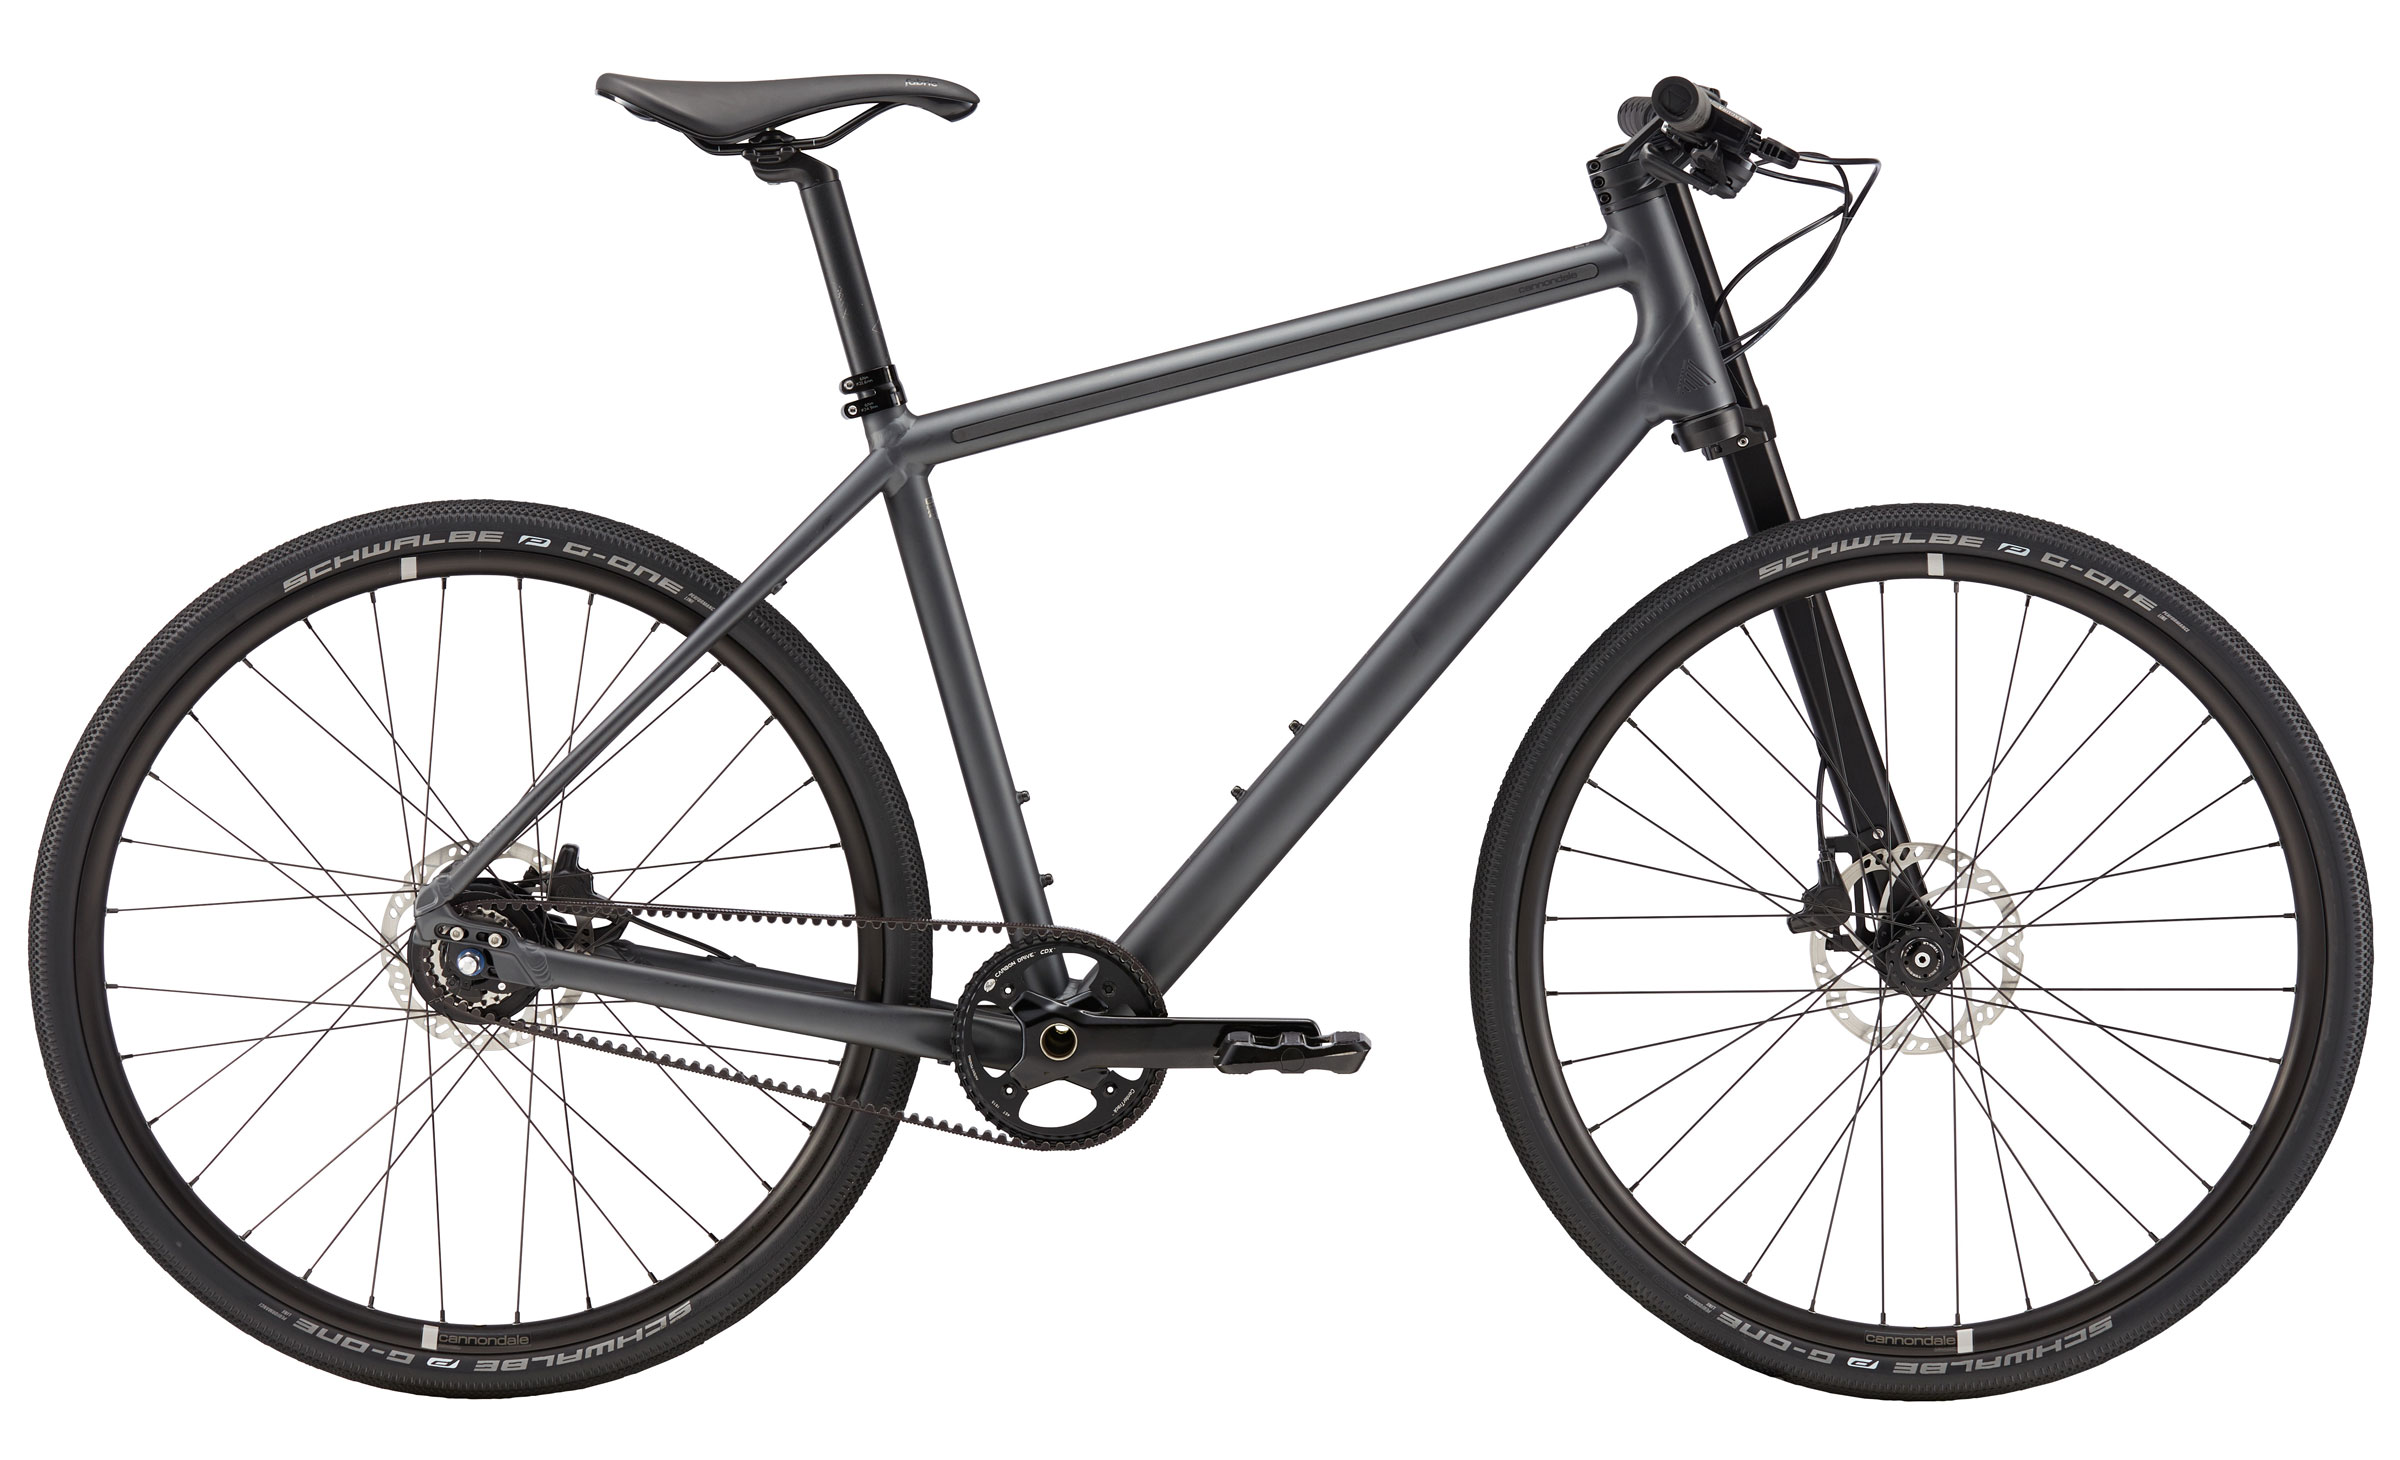 97cec213553 Cannondale Bad Boy 1 - Bike Shop Sid's Bikes NYC New York 212-989-1060